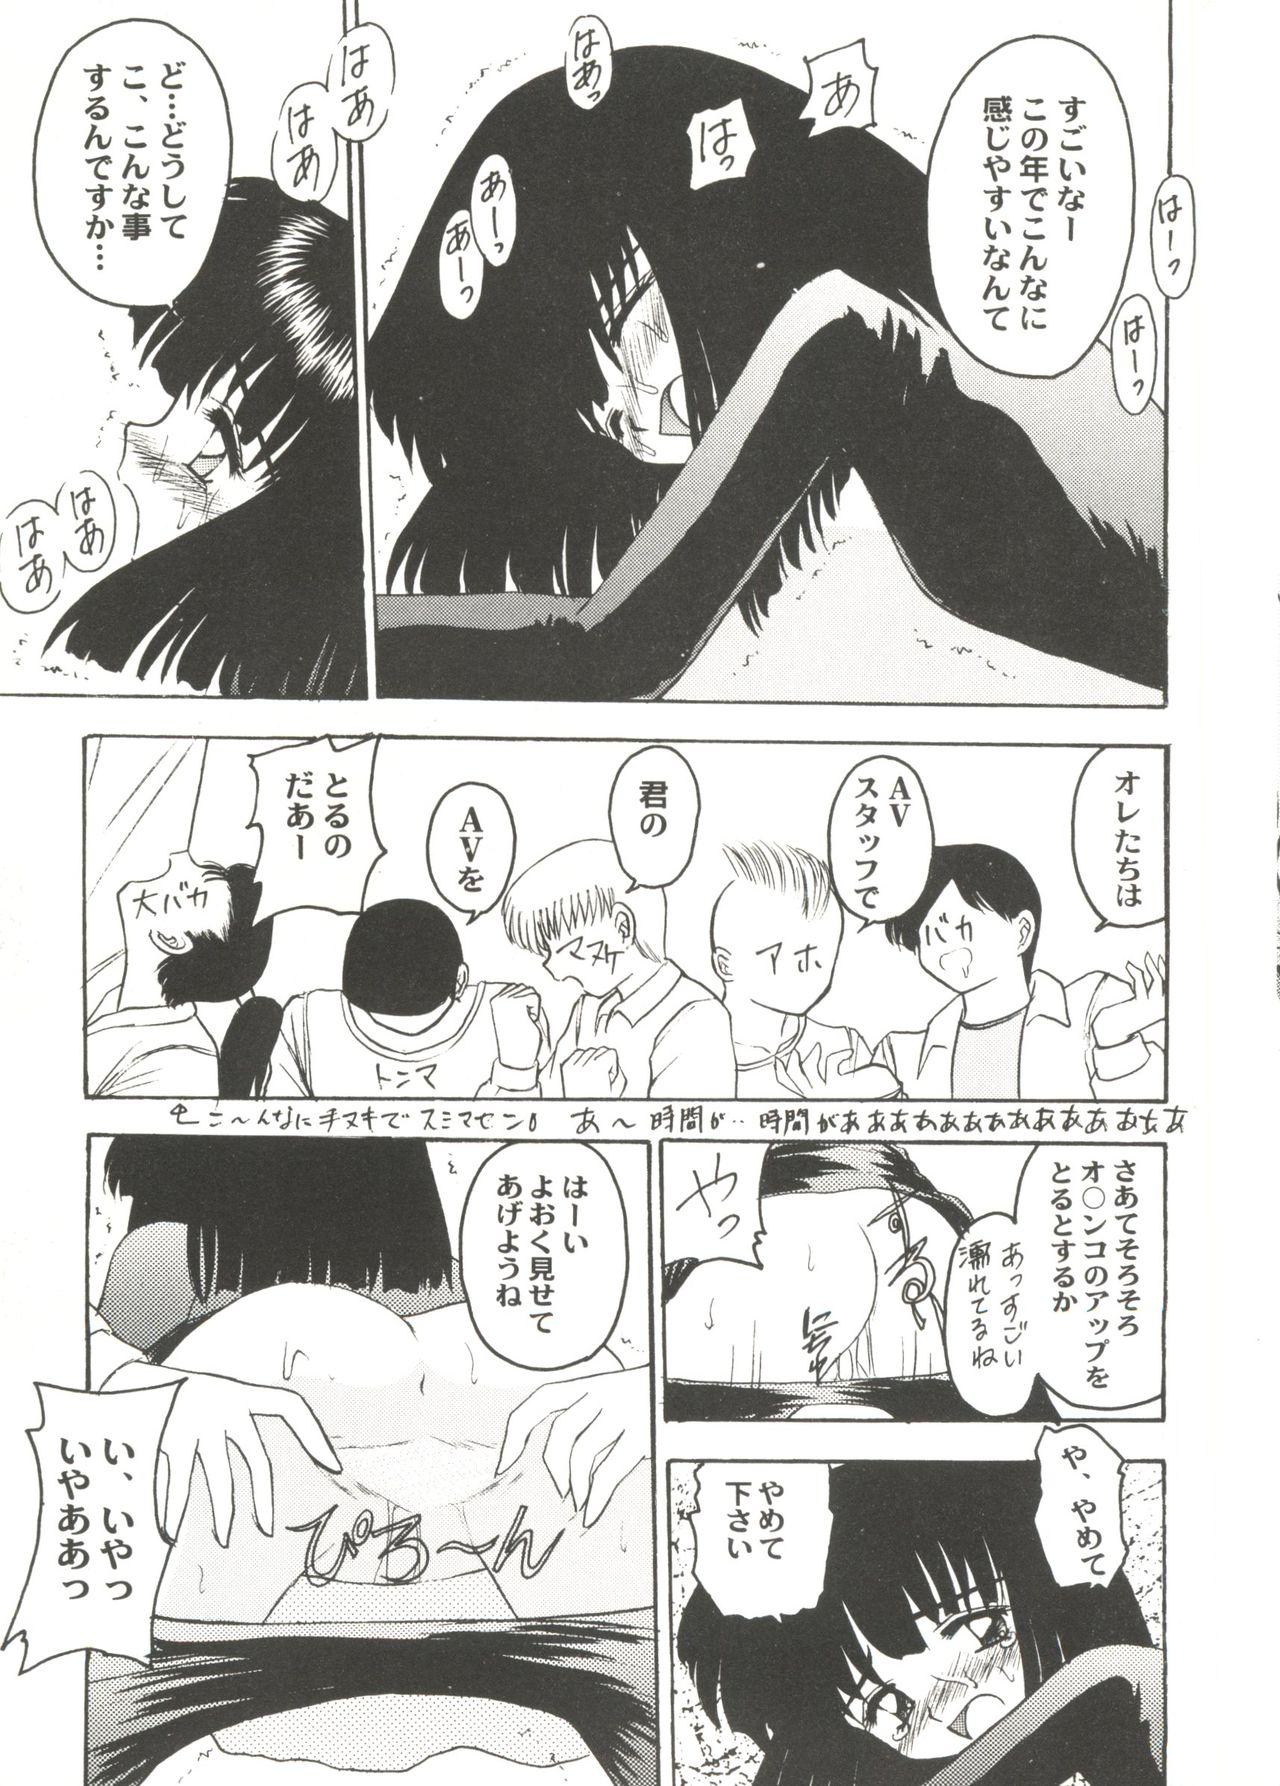 Bishoujo Doujin Peach Club - Pretty Gal's Fanzine Peach Club 9 68